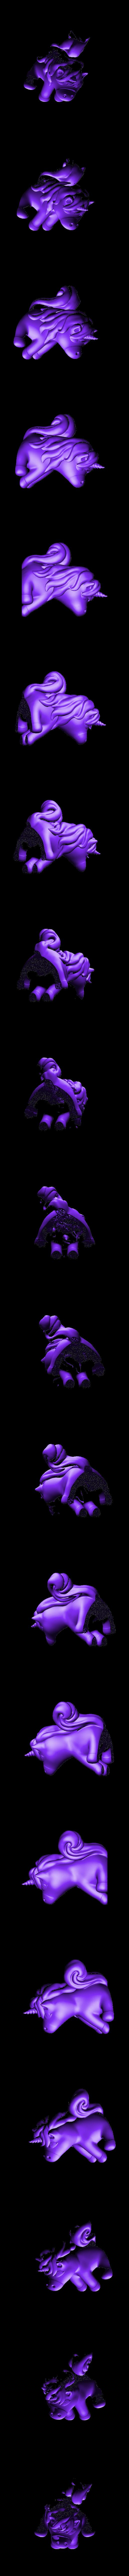 CuteUnicorn.stl Download free STL file PowderPuff Unicorn • 3D printing template, ChaosCoreTech